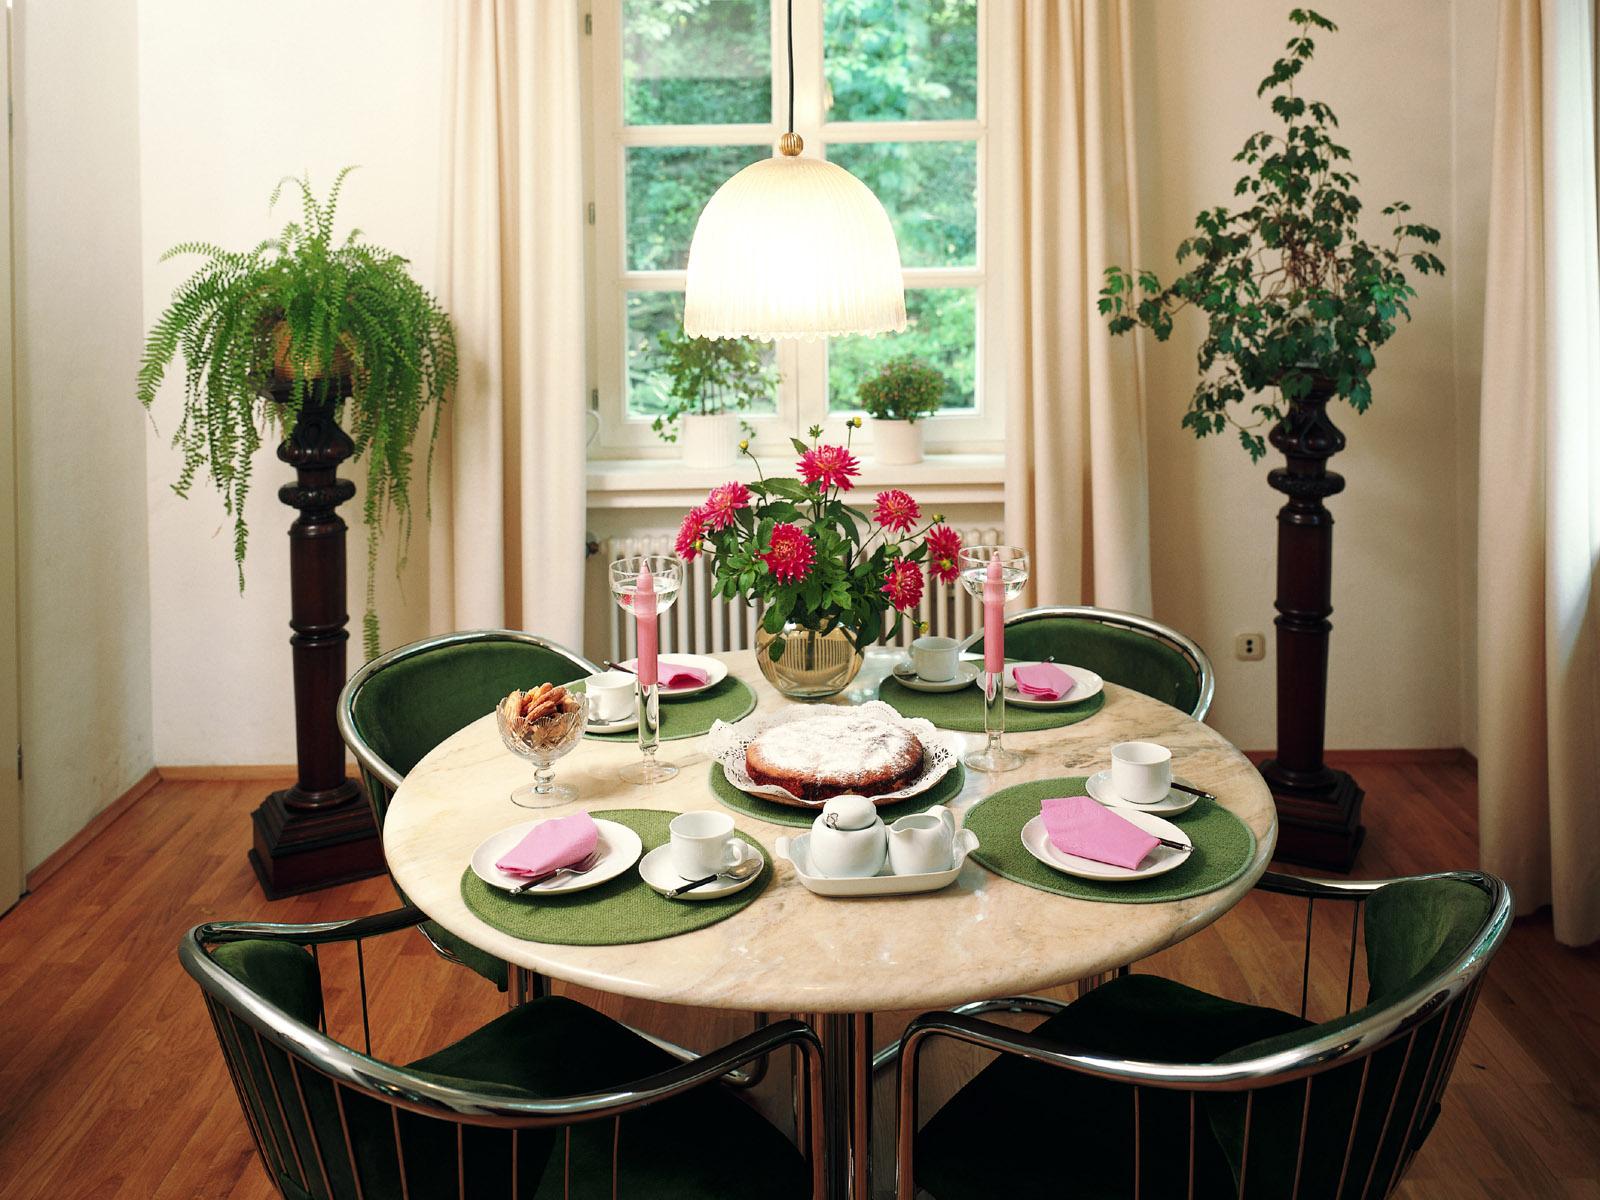 Feng Shui Nella Sala Da Pranzo I Tavoli Da Pranzo #754027 1600 1200 Sala Da Pranzo Fai Da Te